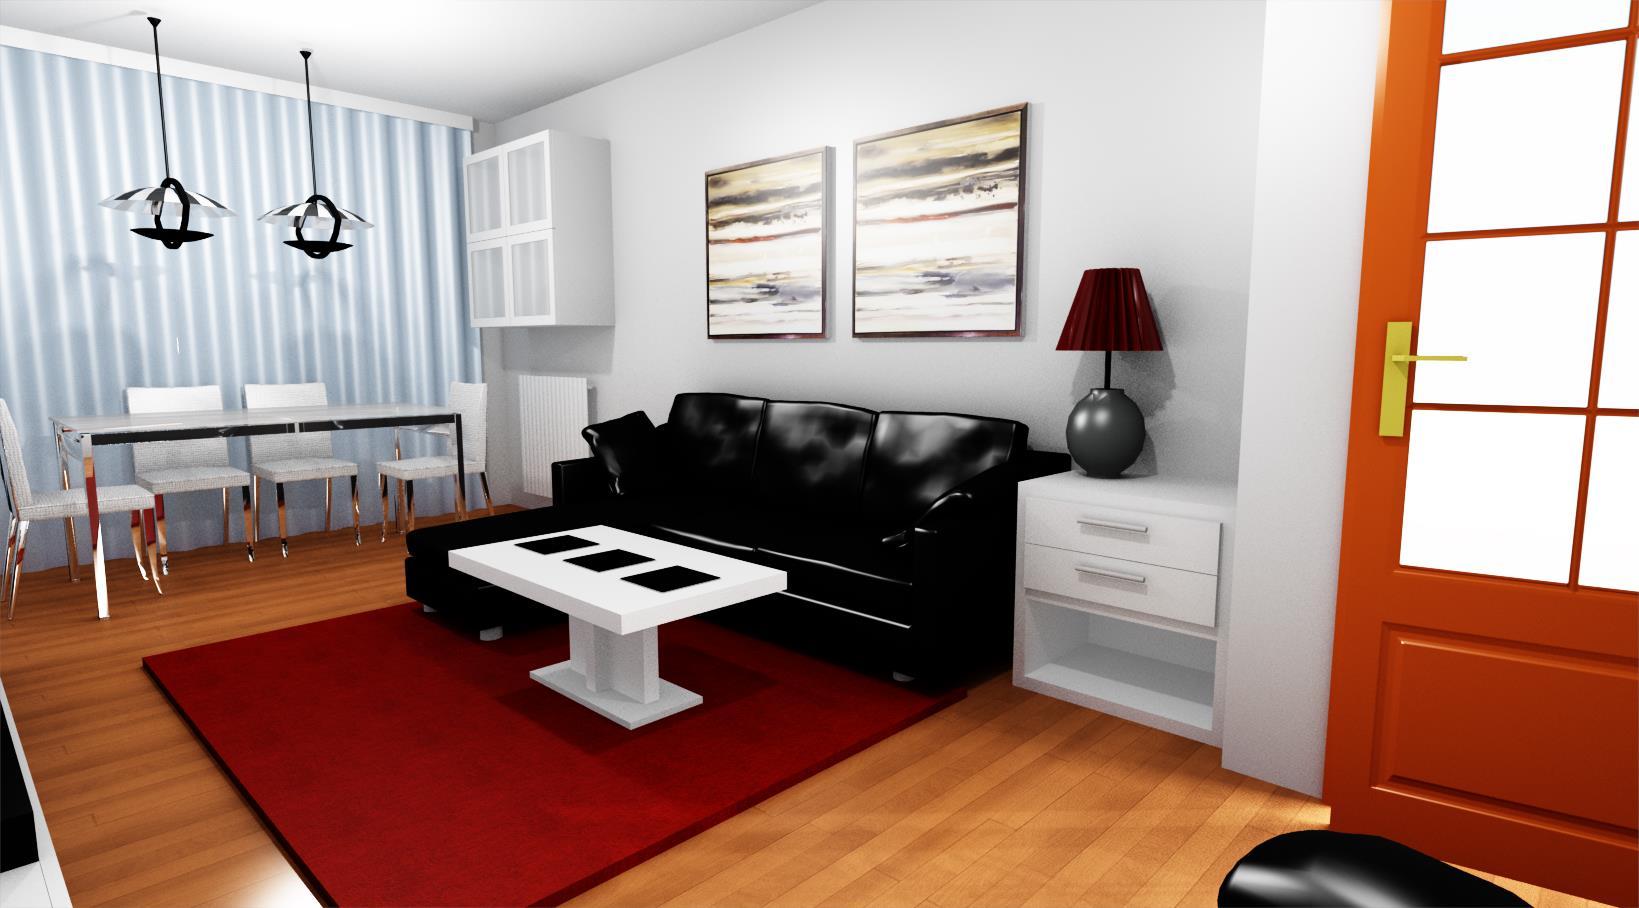 Proyecto decoraci n sal n comedor reformas y decoraci n for Proyecto decoracion interiores